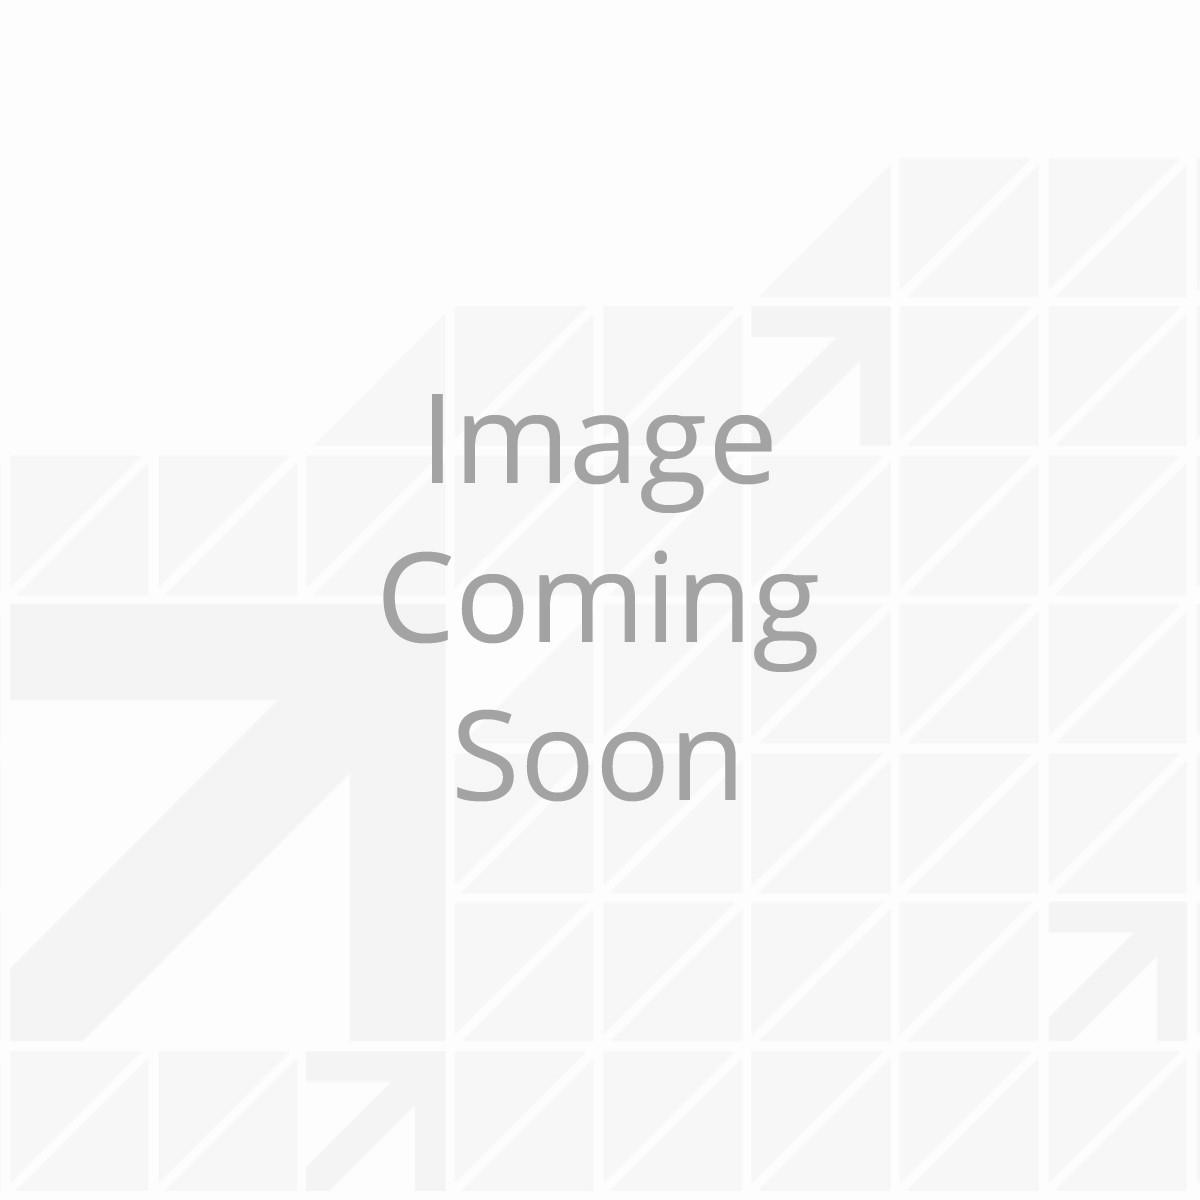 Never Fail Shackle and Bolt Kit; Triple Axle Configuration